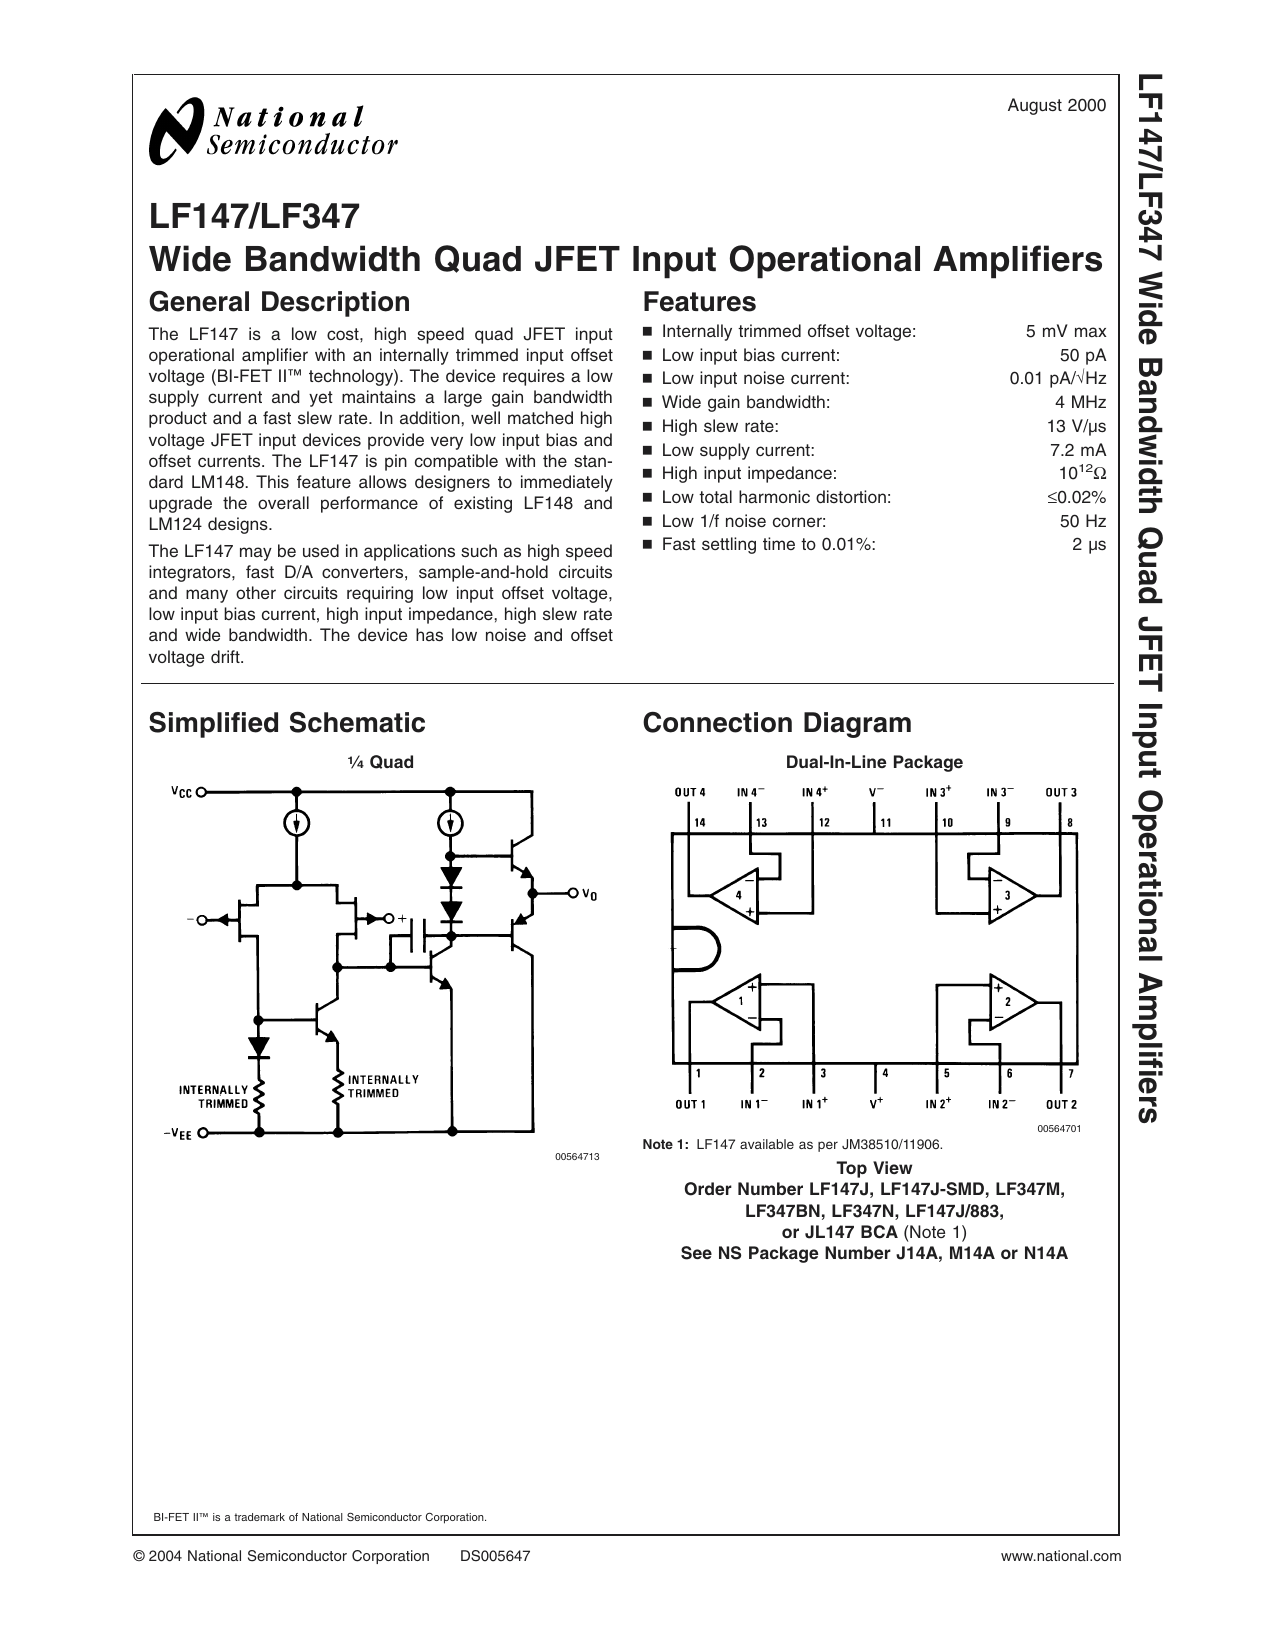 Lf147 Lf347 Wide Bandwidth Quad Jfet Input Operational Amplifiers Ac Coupled Integrator